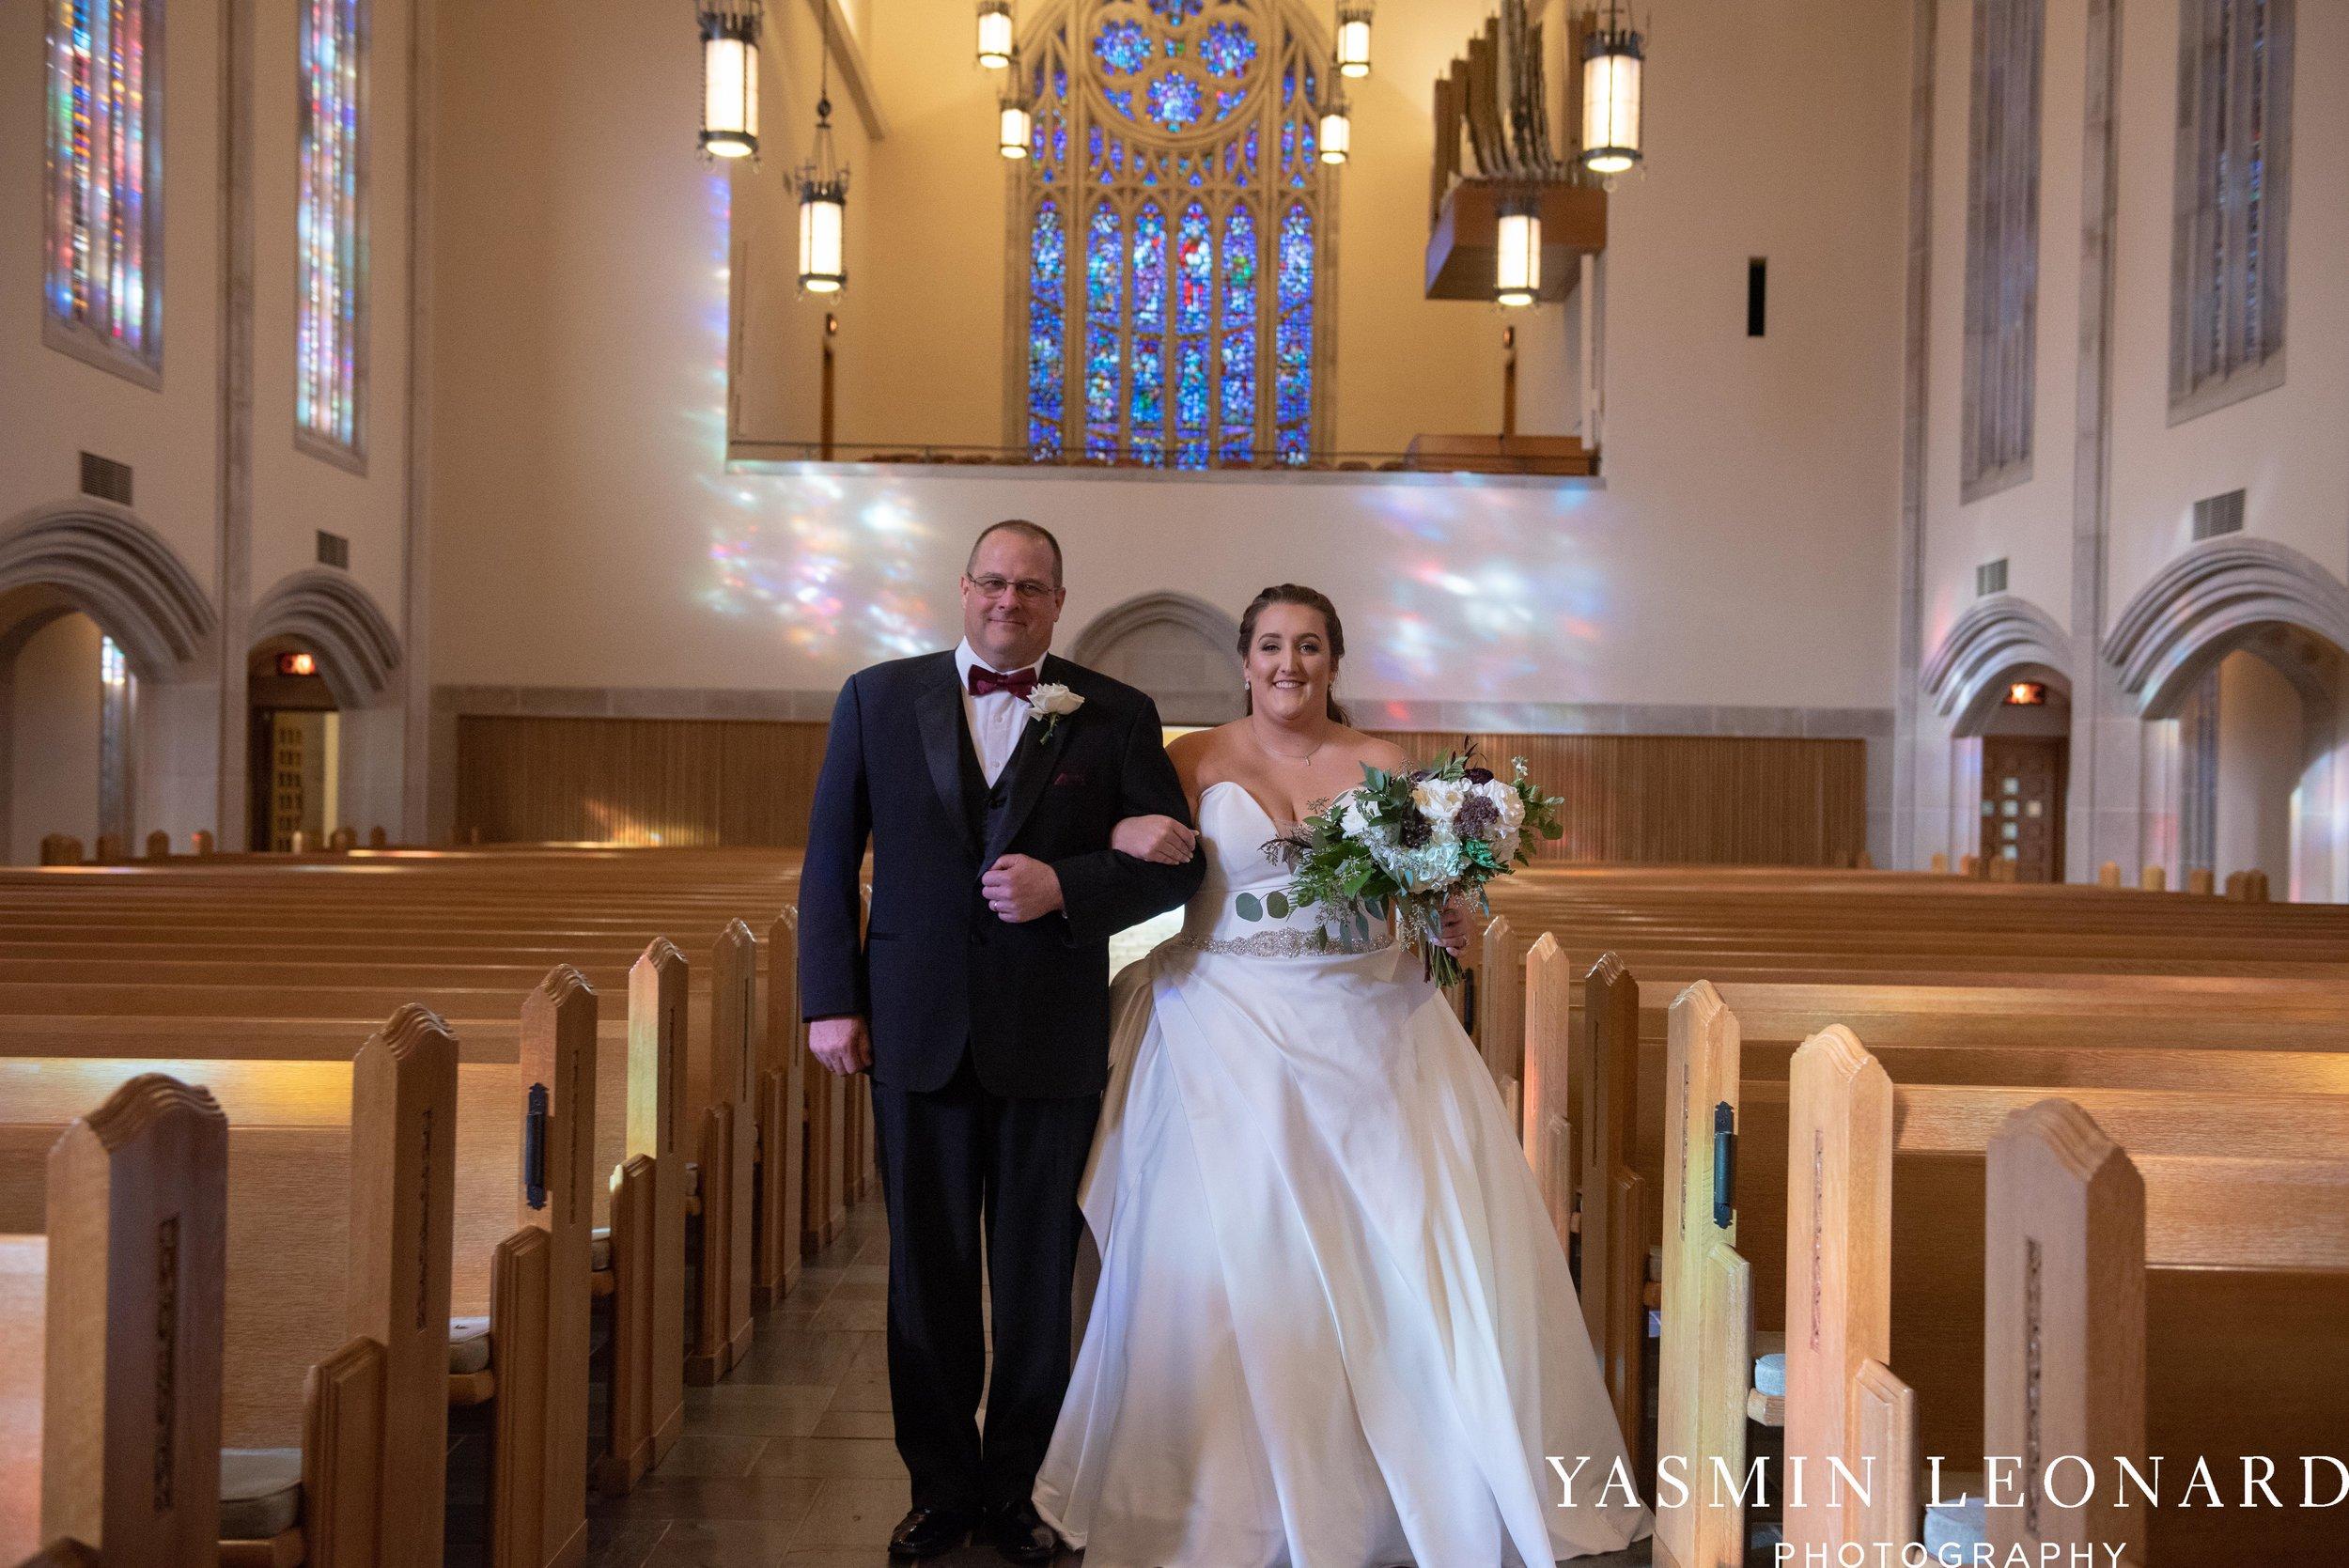 Wesley Memorial United Methodist Church - Old Homeplace Winery - High Point Weddings - High Point Wedding Photographer - NC Weddings - NC Barn Venue - Yasmin Leonard Photography-13.jpg